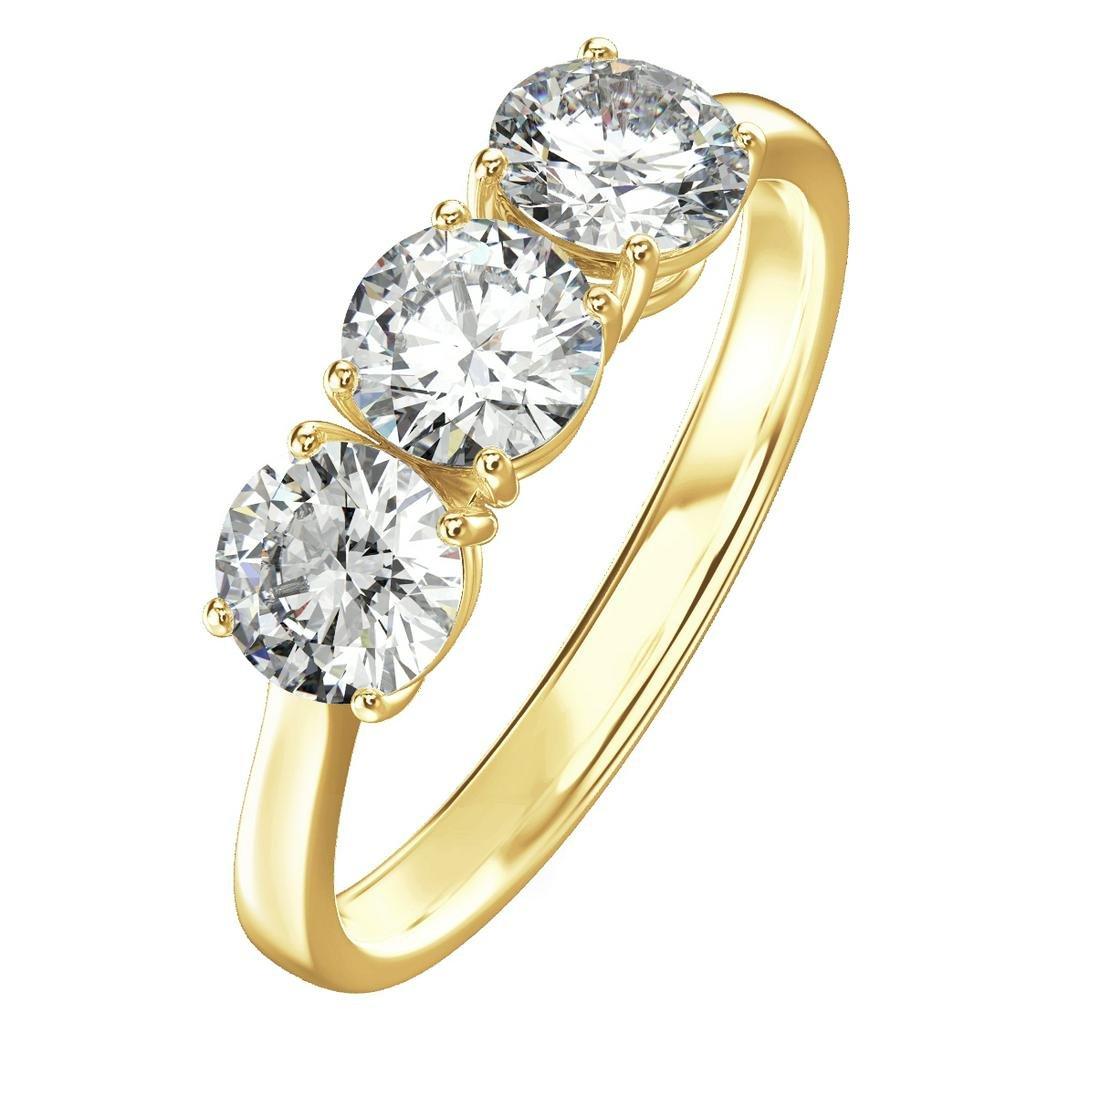 1.50 Carat 3 Stone Diamond Engagement Ring in 18K